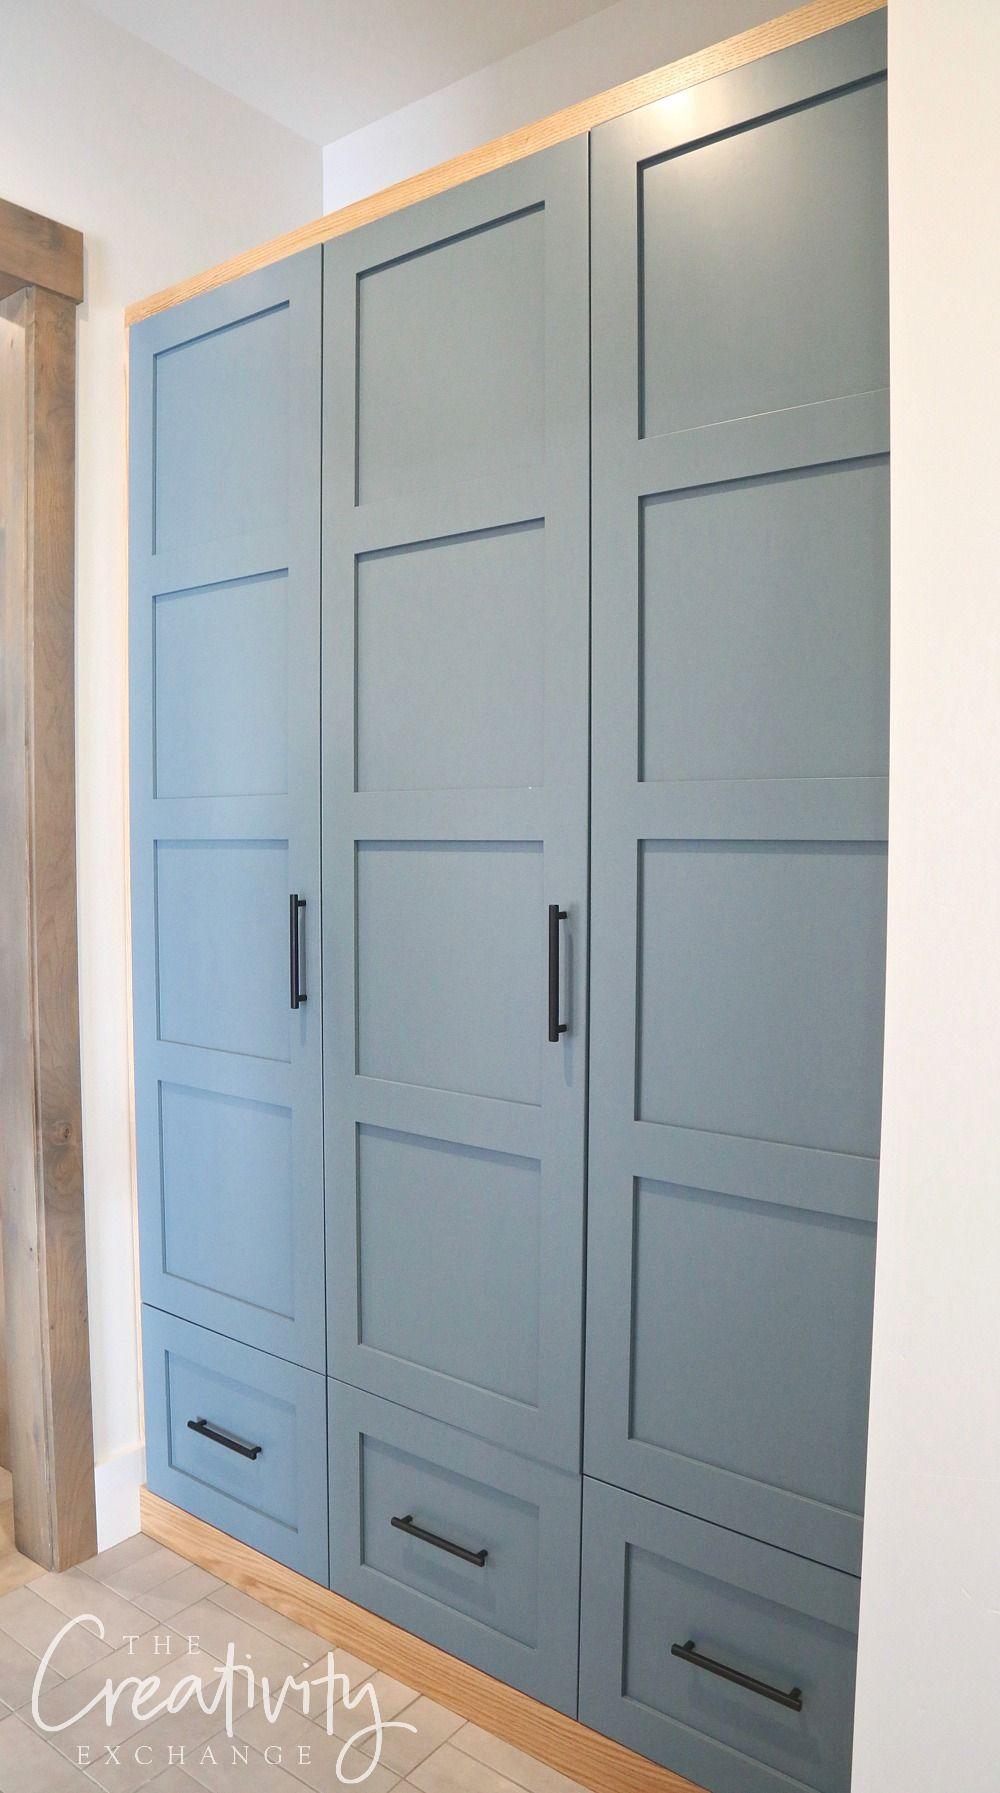 Sherwin Williams Slate Tile Color Spotlight Mudroom Cabinetry Home Remodeling Slate Tile